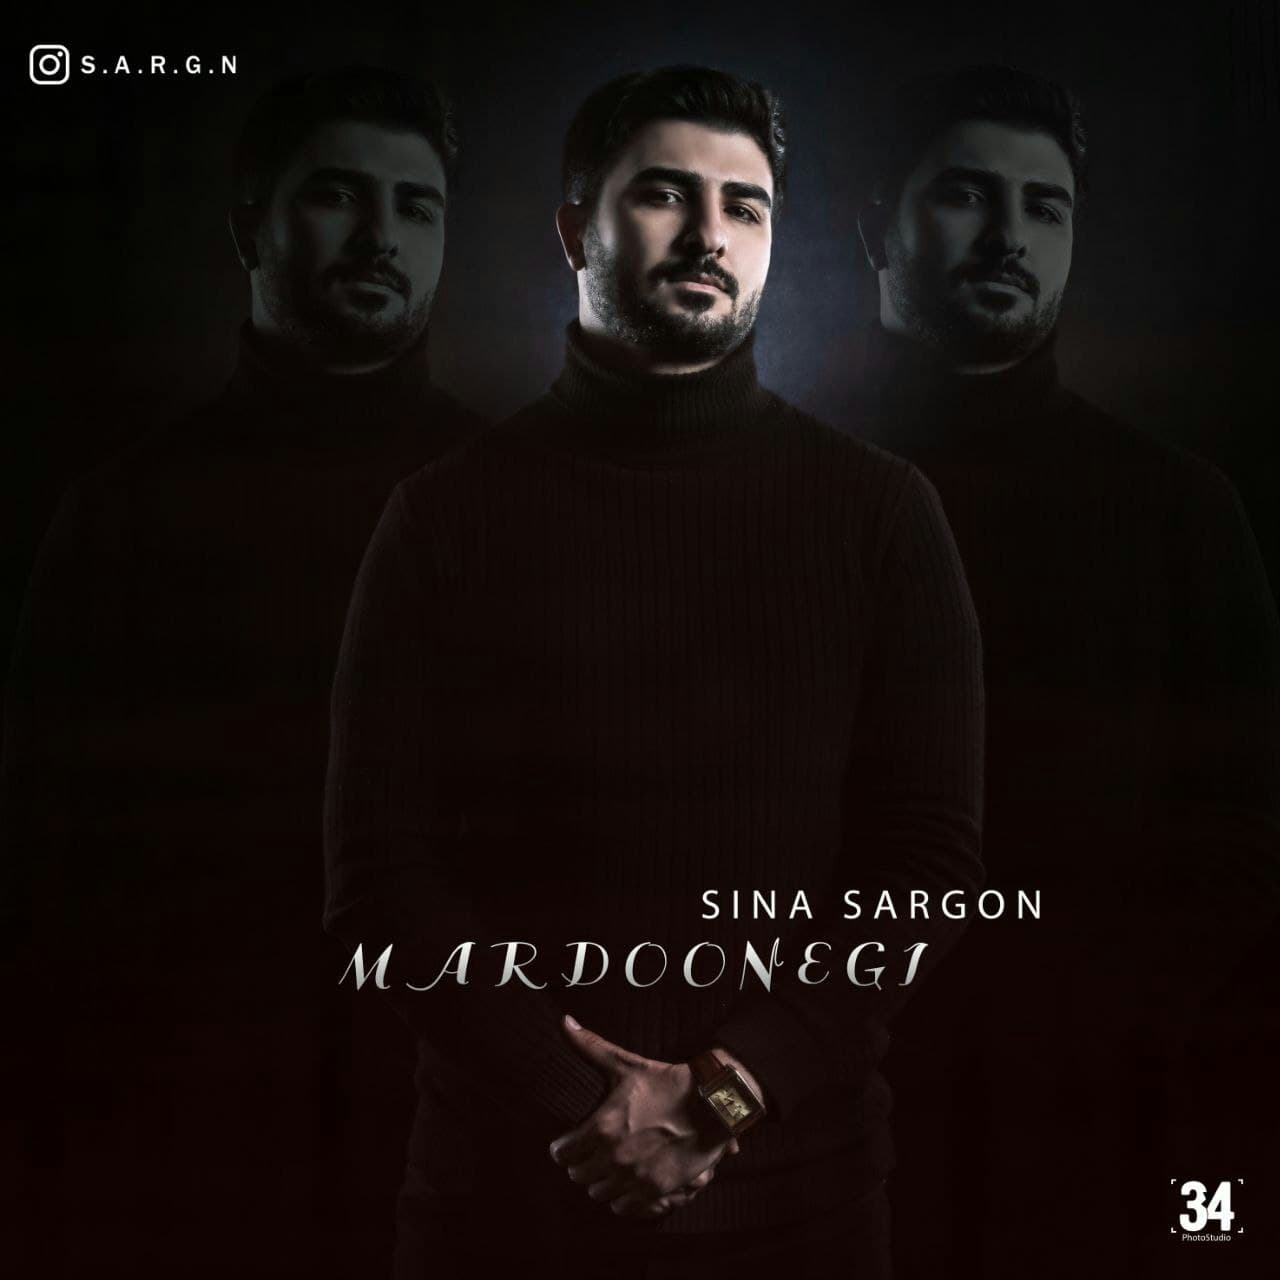 Sina Sargon – Mardoonegi